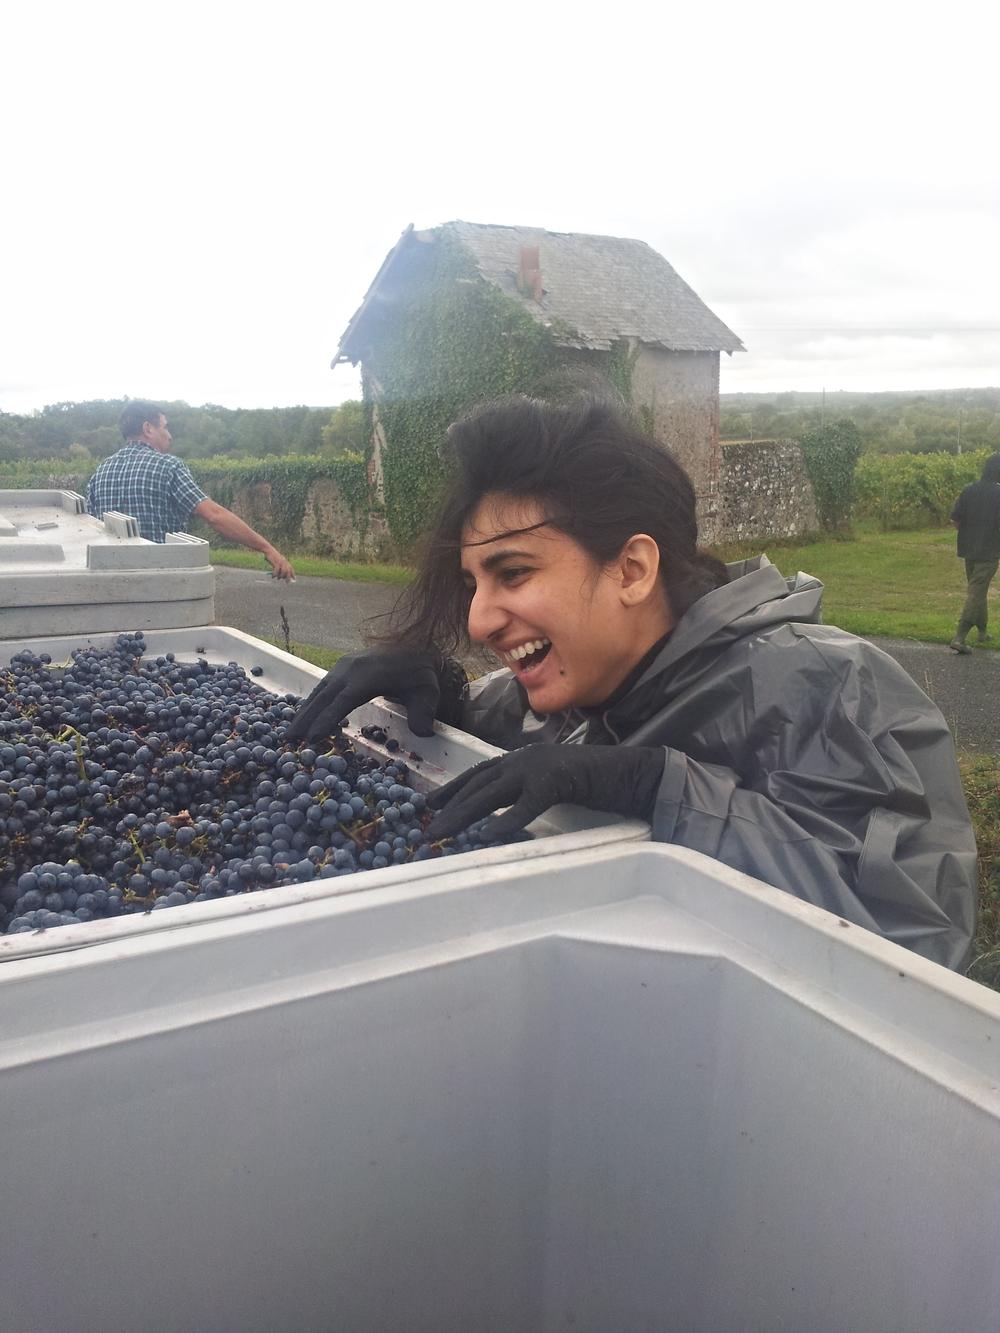 Having a laugh after harvesting Cabernet Franc grapes